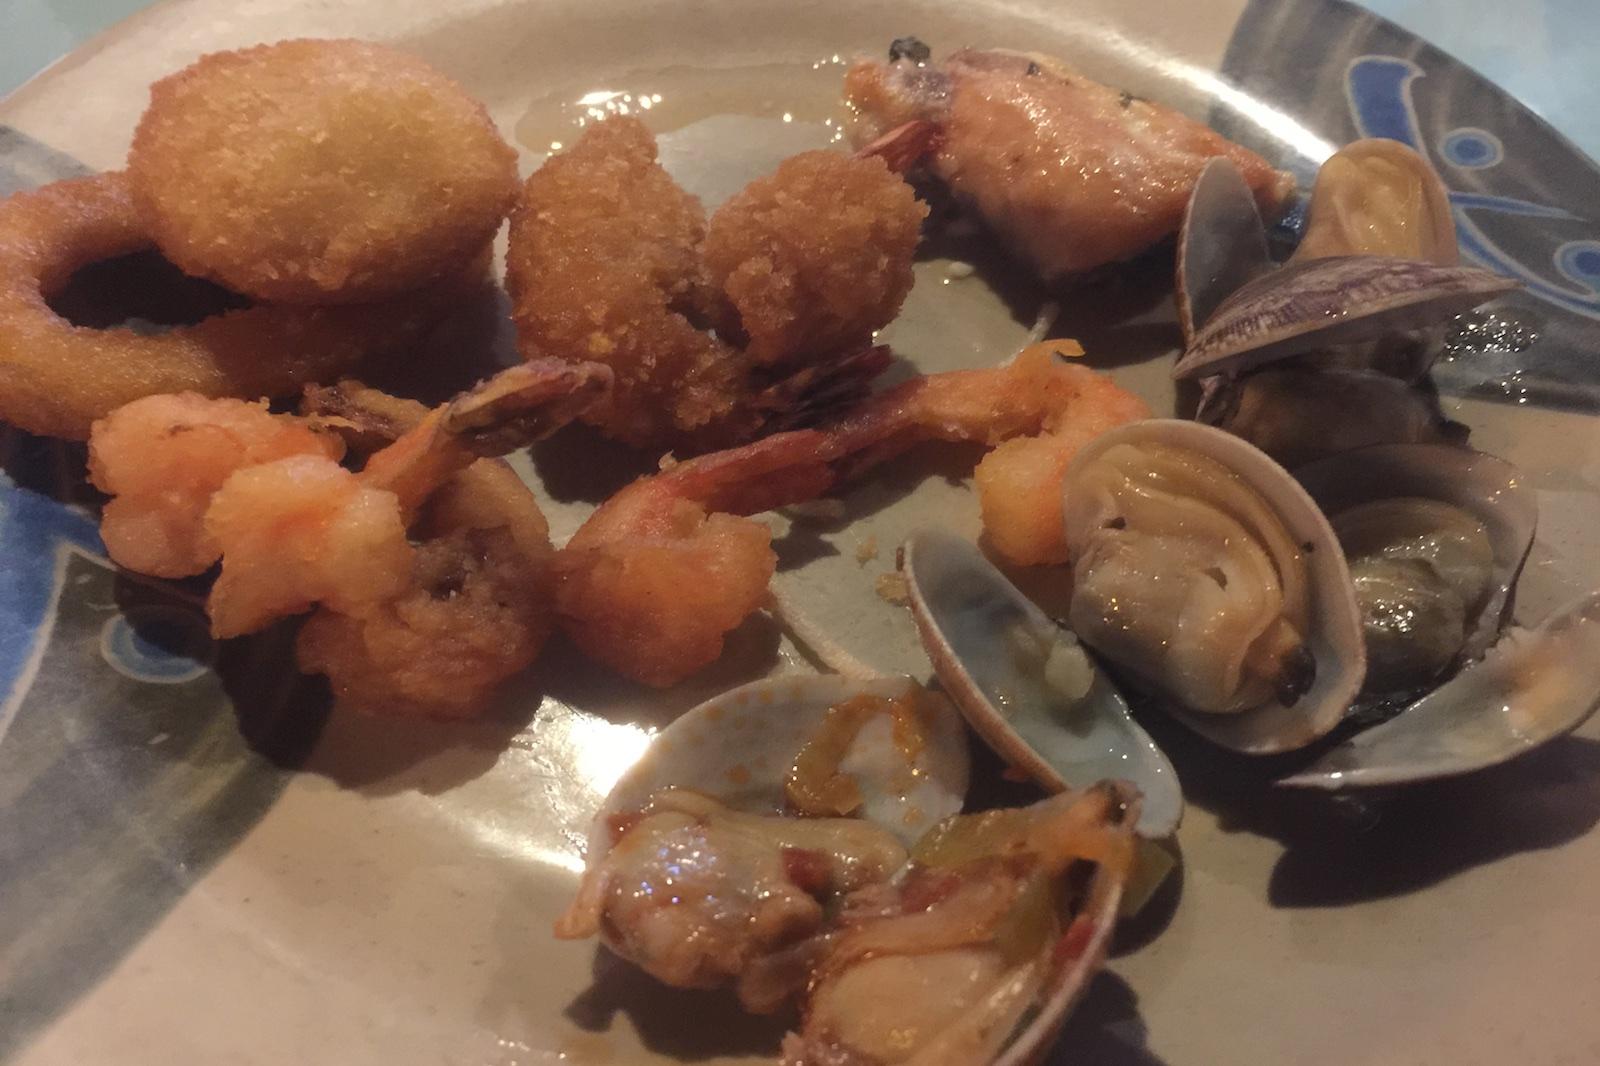 http://blog.rickk.com/food/2016/08/15/ate.2016.08.14.d2.jpg